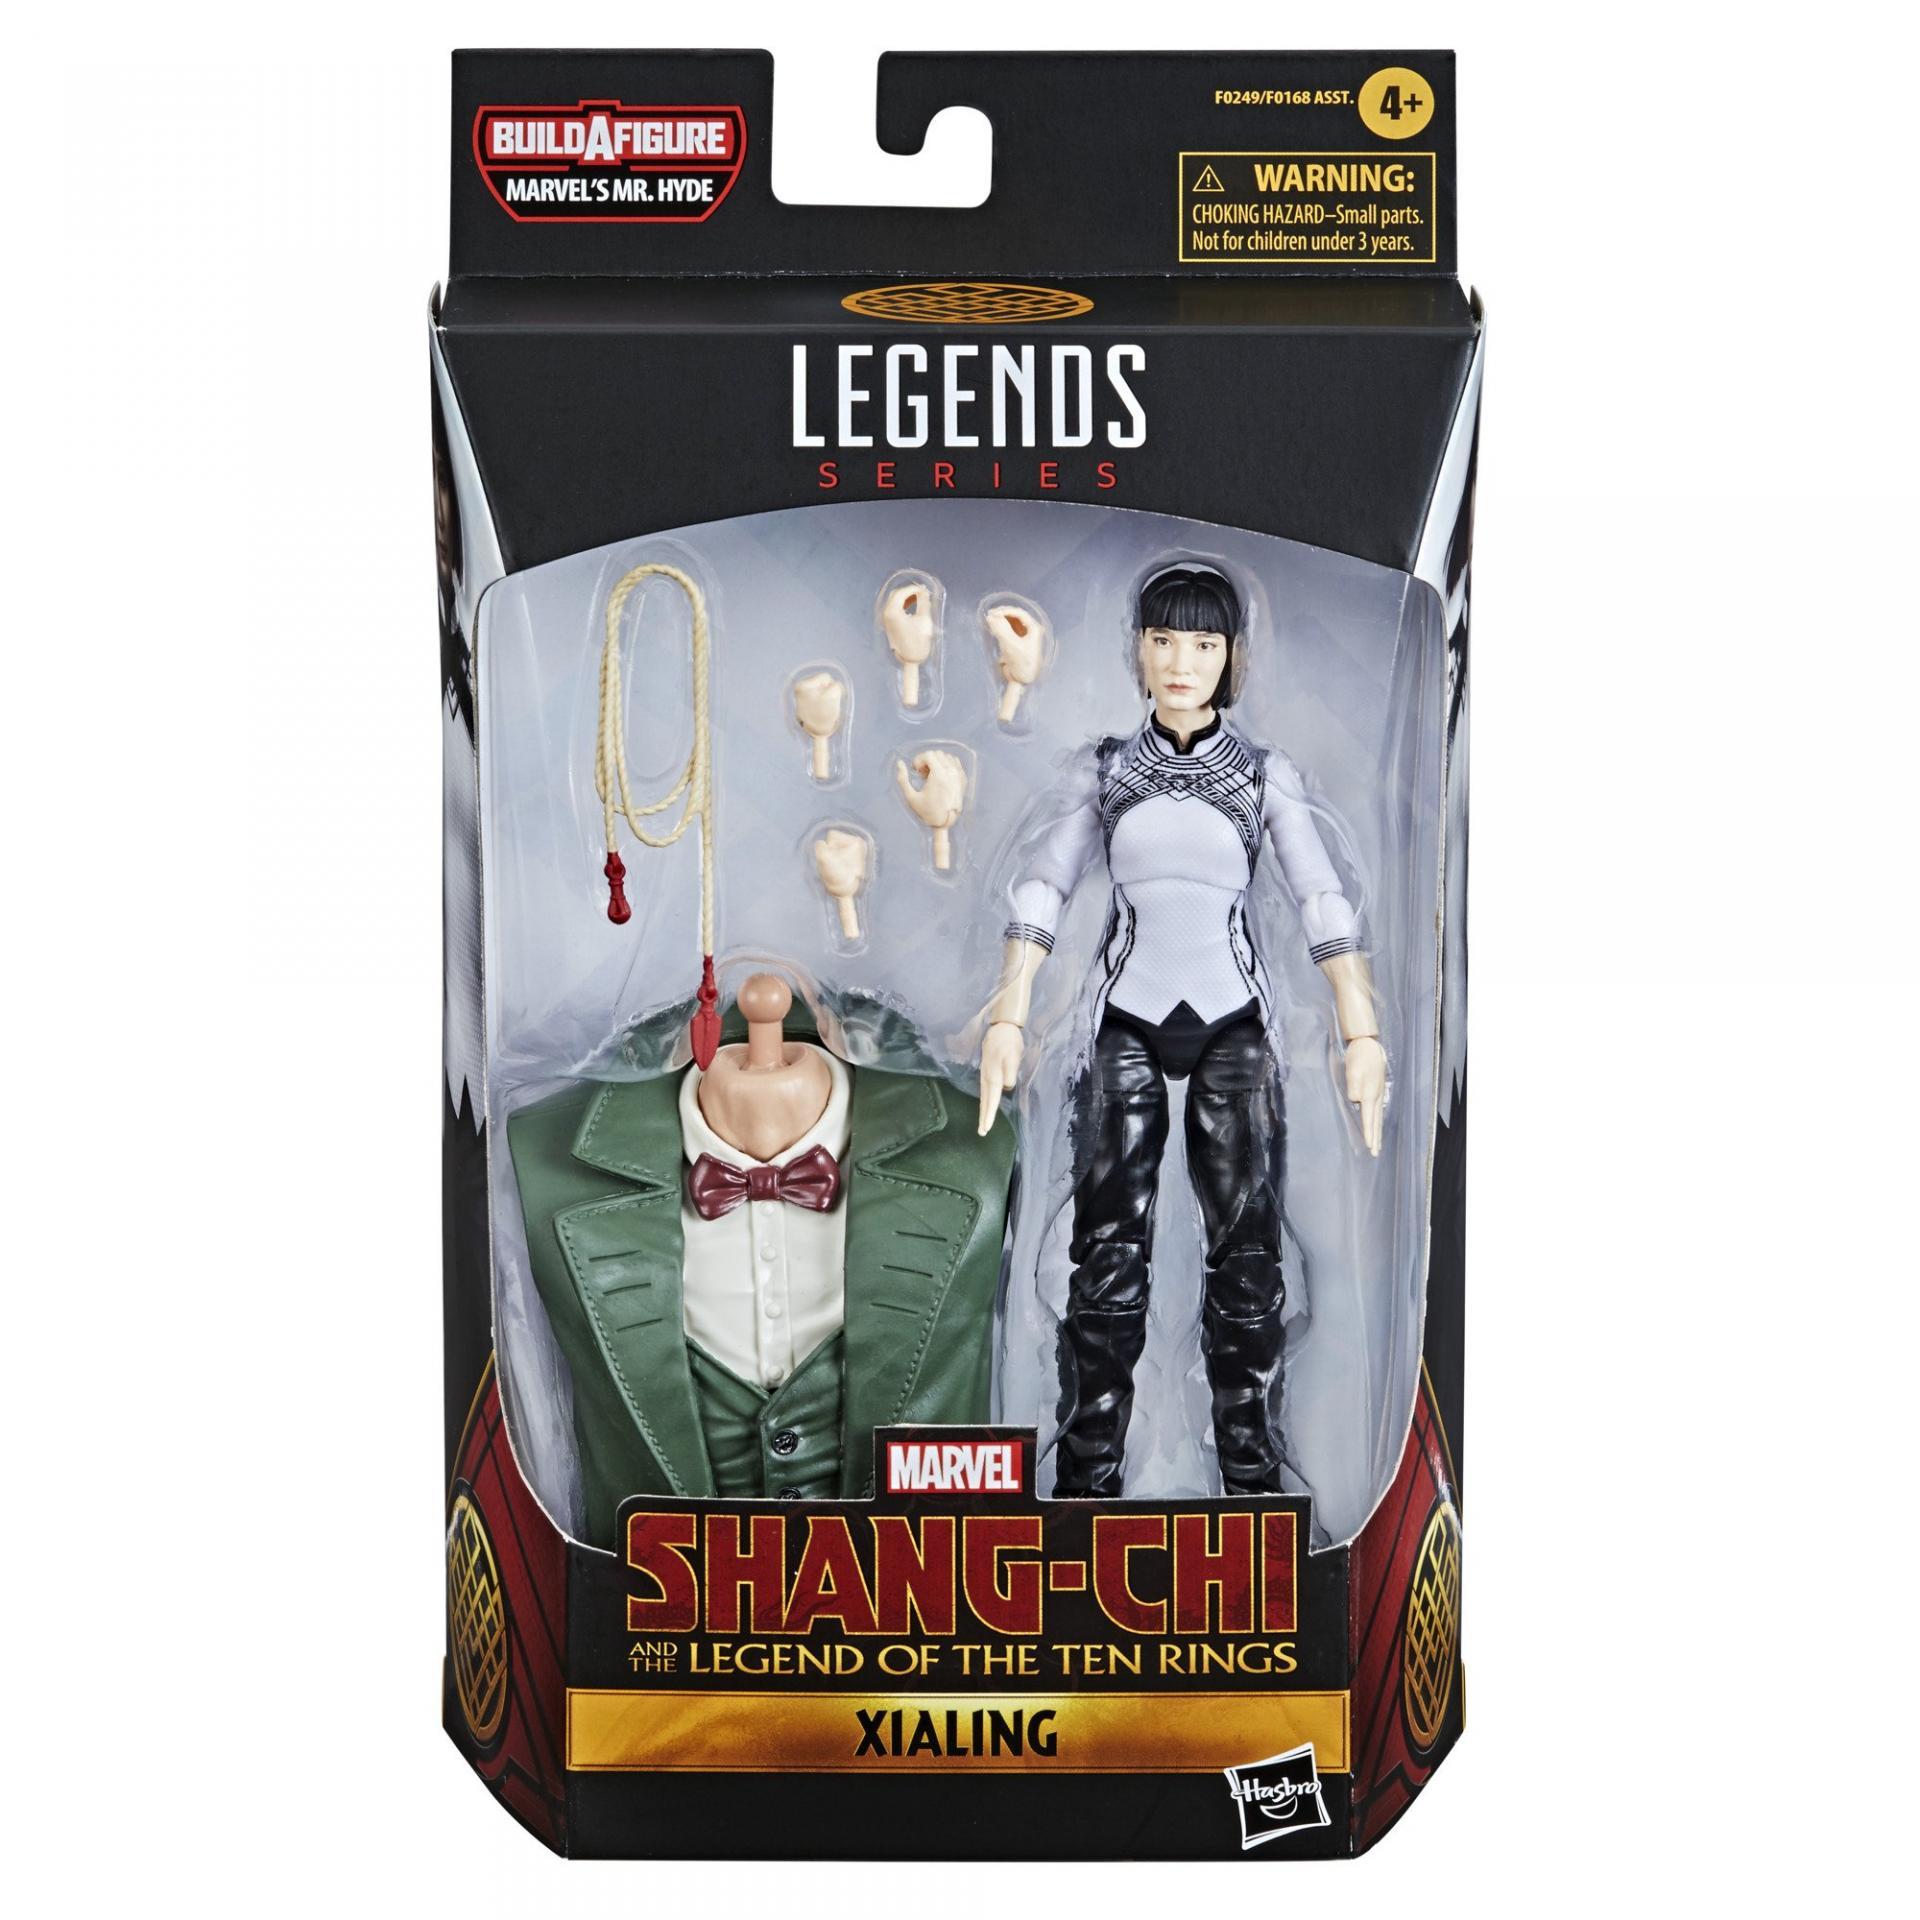 Marvel legends series hasbro shang chi legend of ten rings xialing